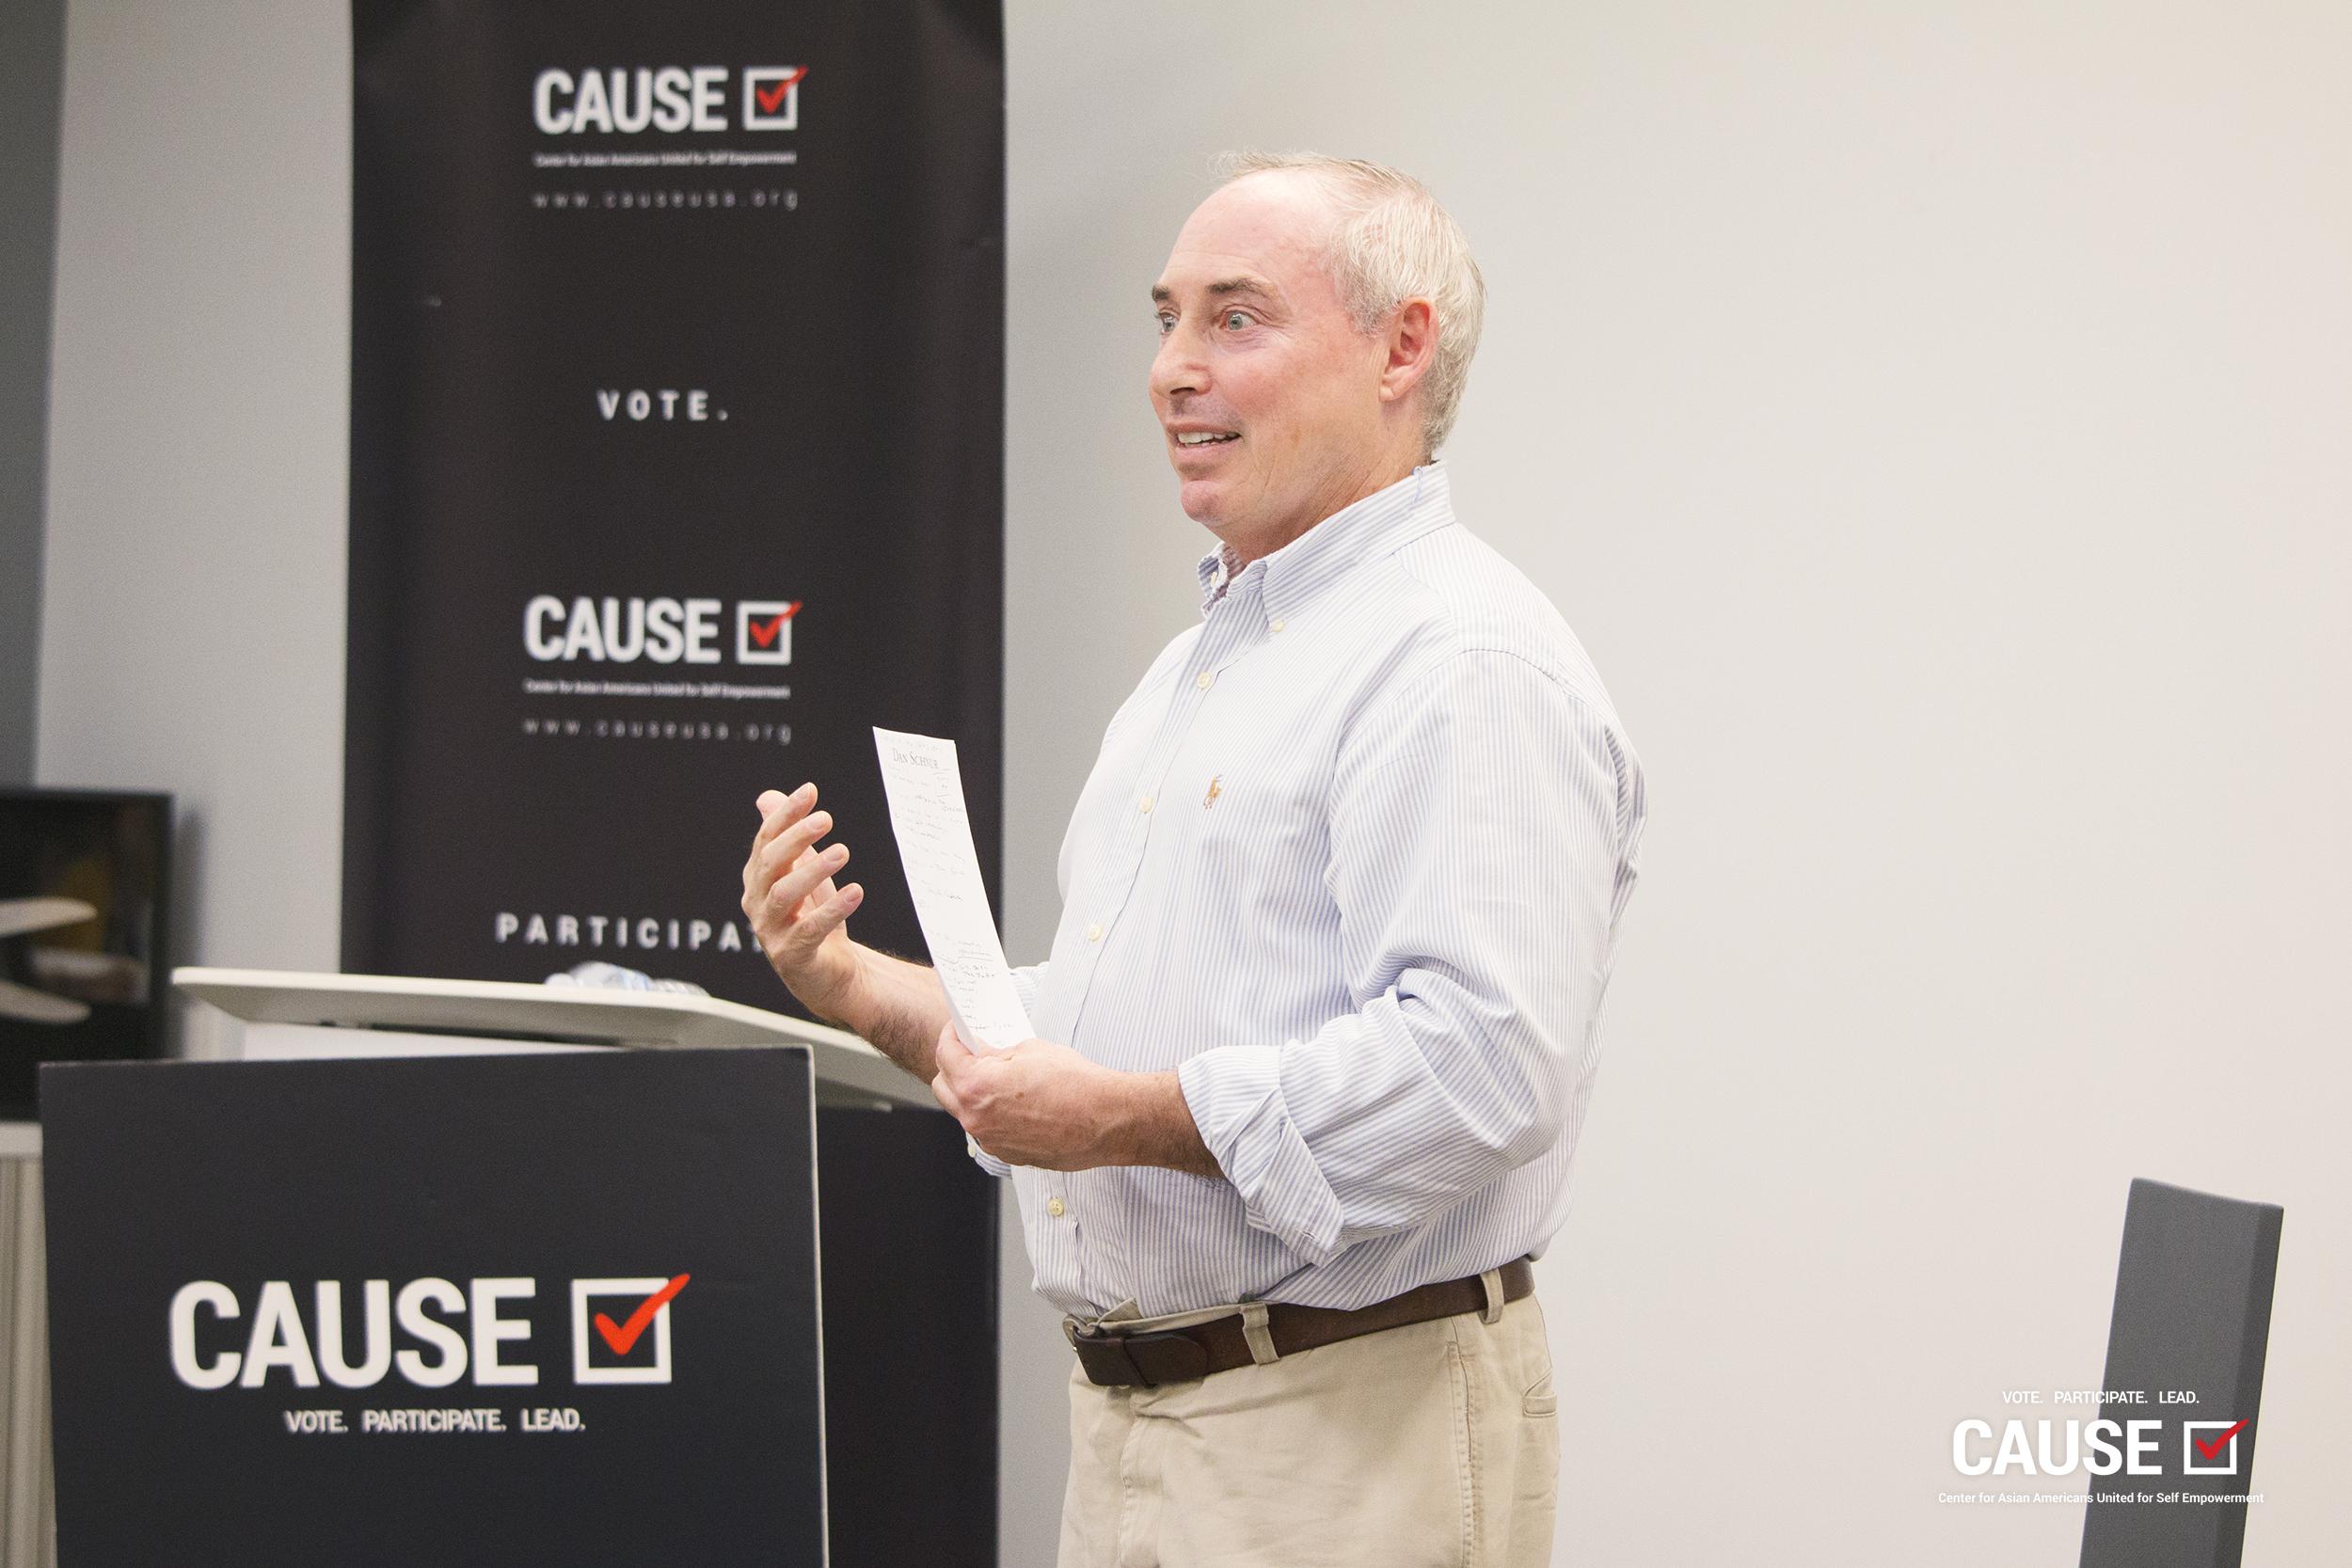 Dan Schnur speaking to the 2019 CAUSE Leadership Institute